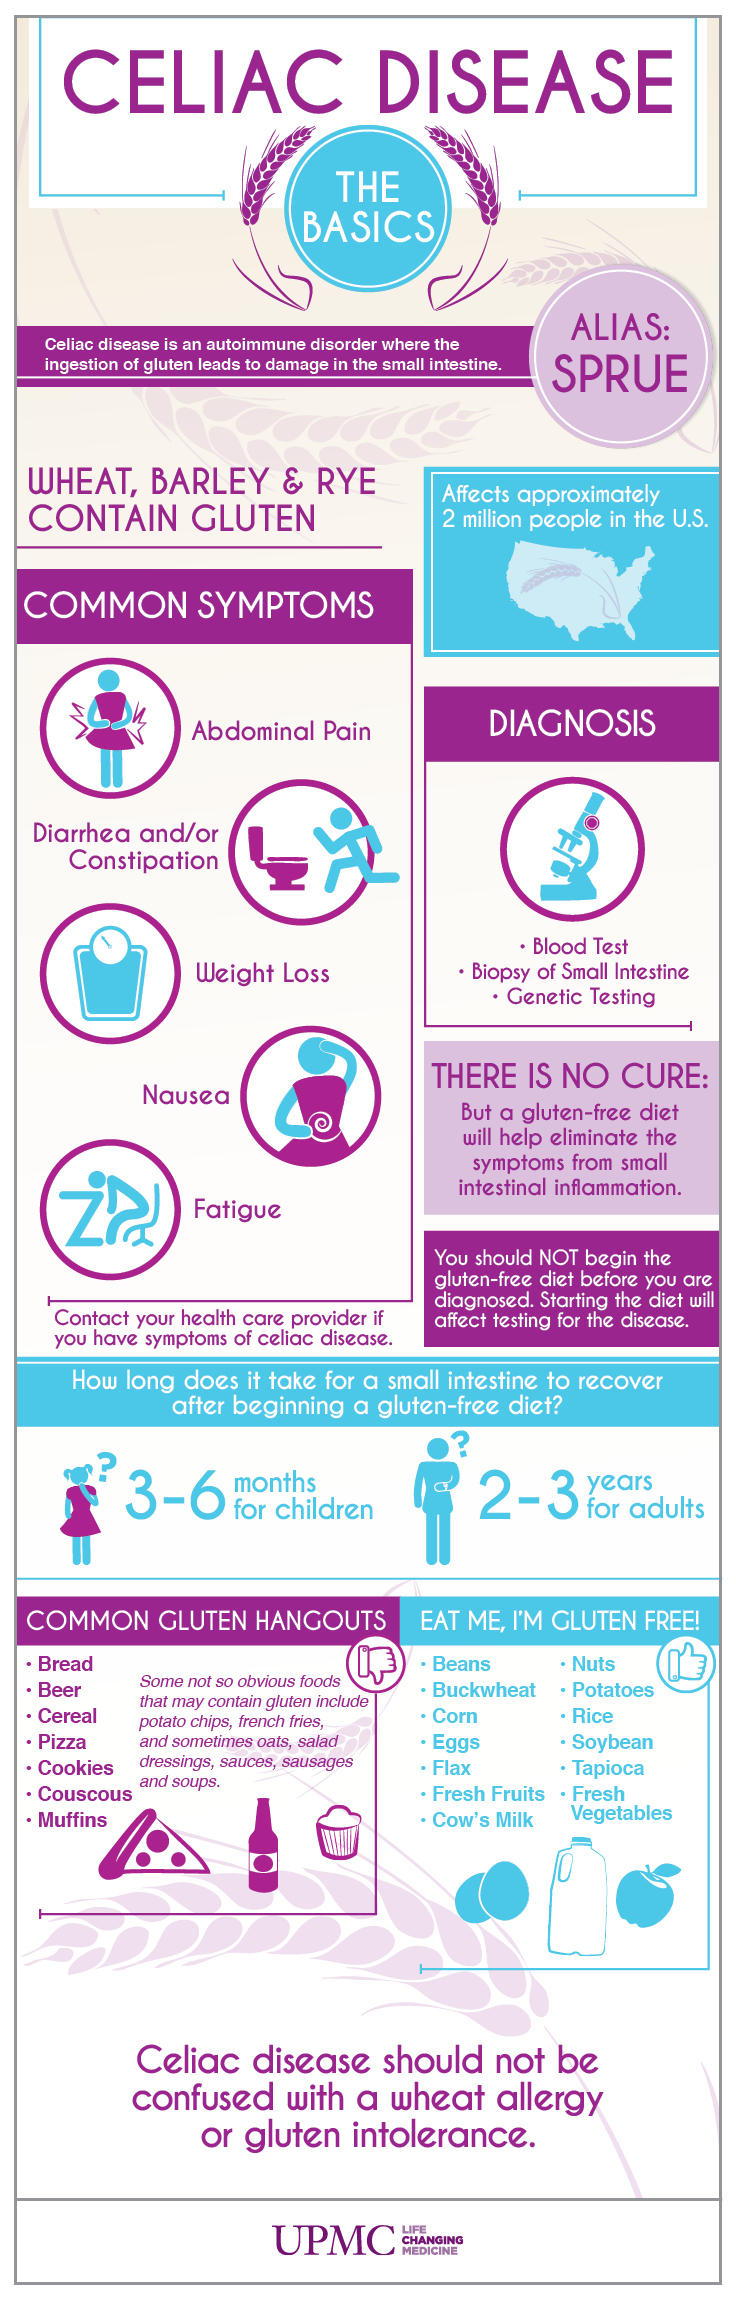 Celiac Disease Causes and Symtoms Infographic   UPMC HealthBeat